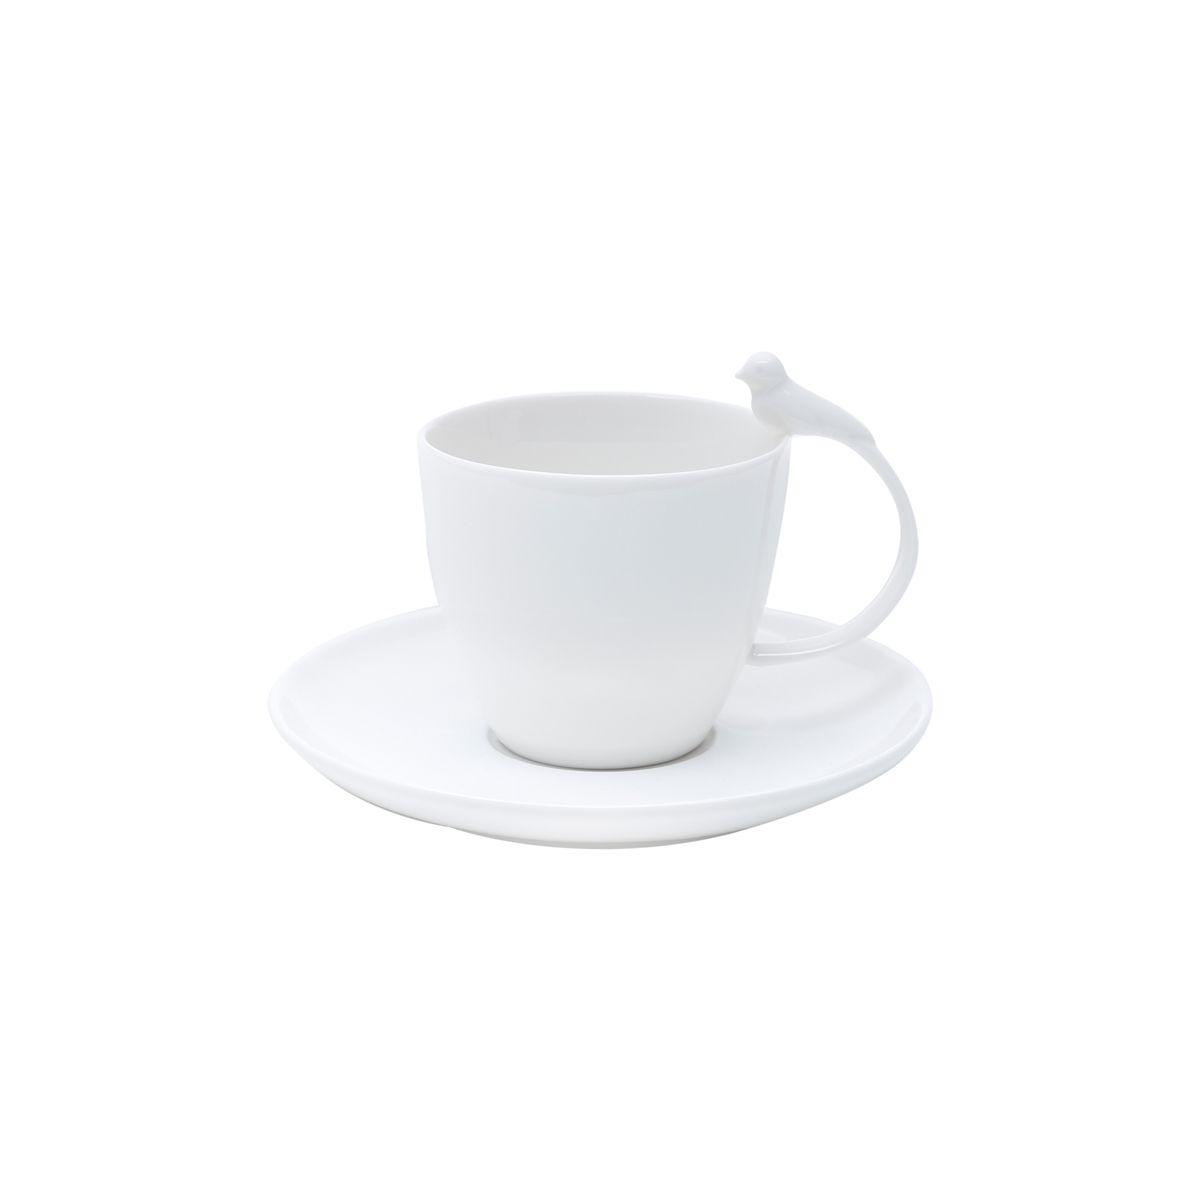 Jg 06 Xícaras de Chá Bird de Porcelana Branca Wolff 200ml